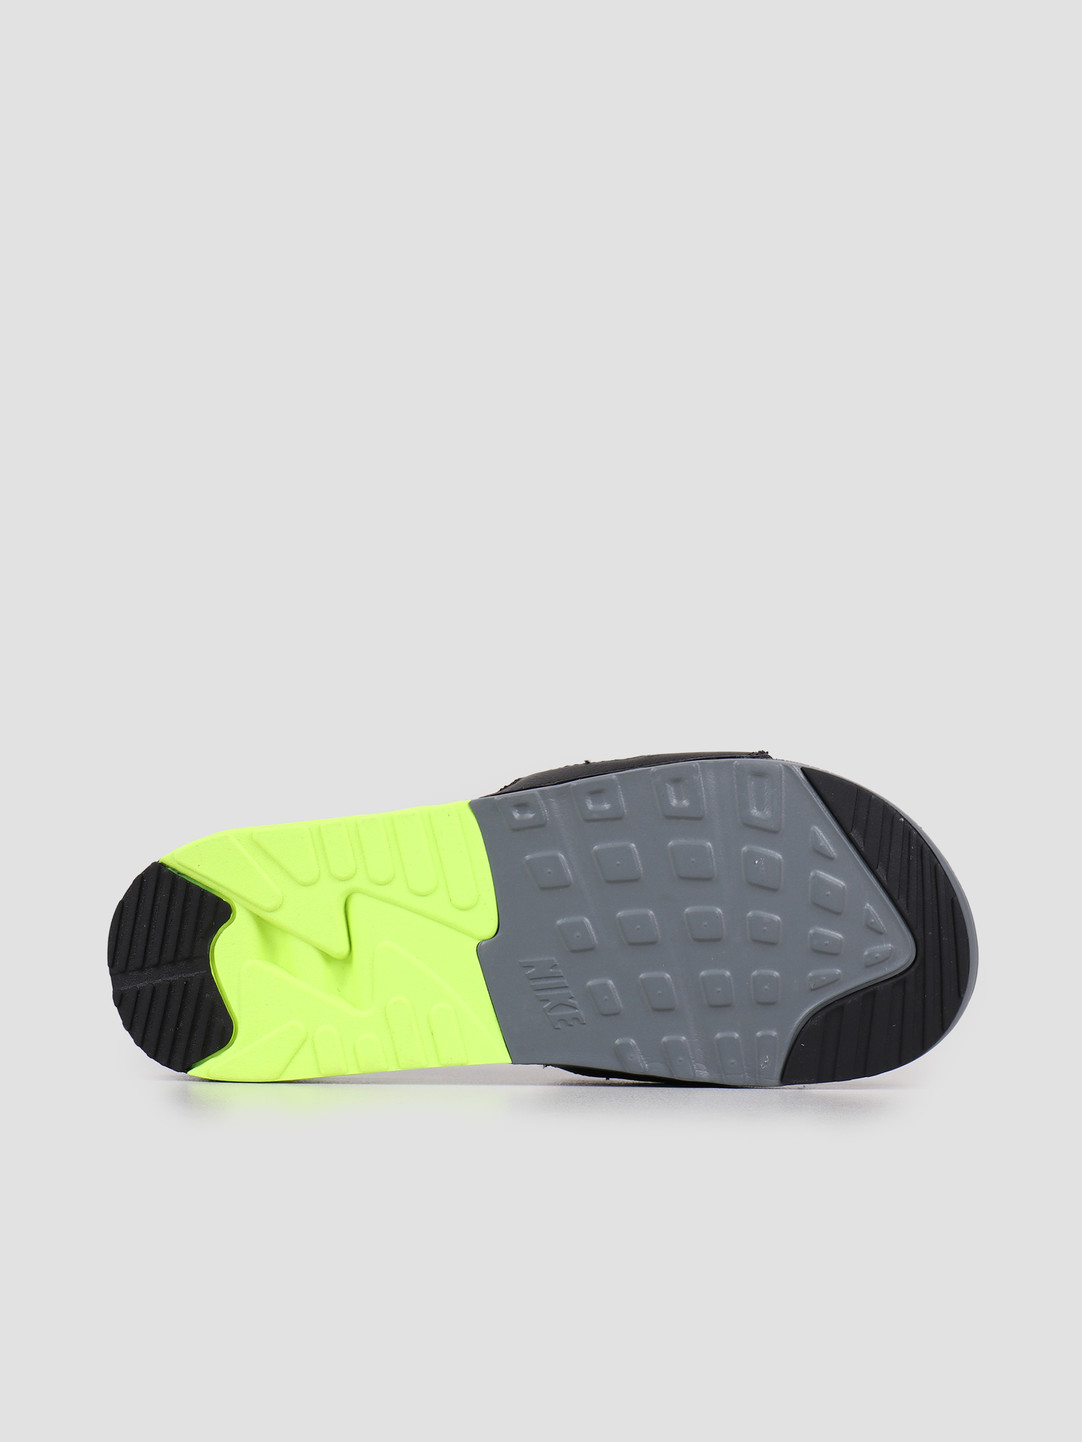 Nike Nike Air Max 90 Slide Smoke Grey Smoke Grey Volt Black BQ4635-001